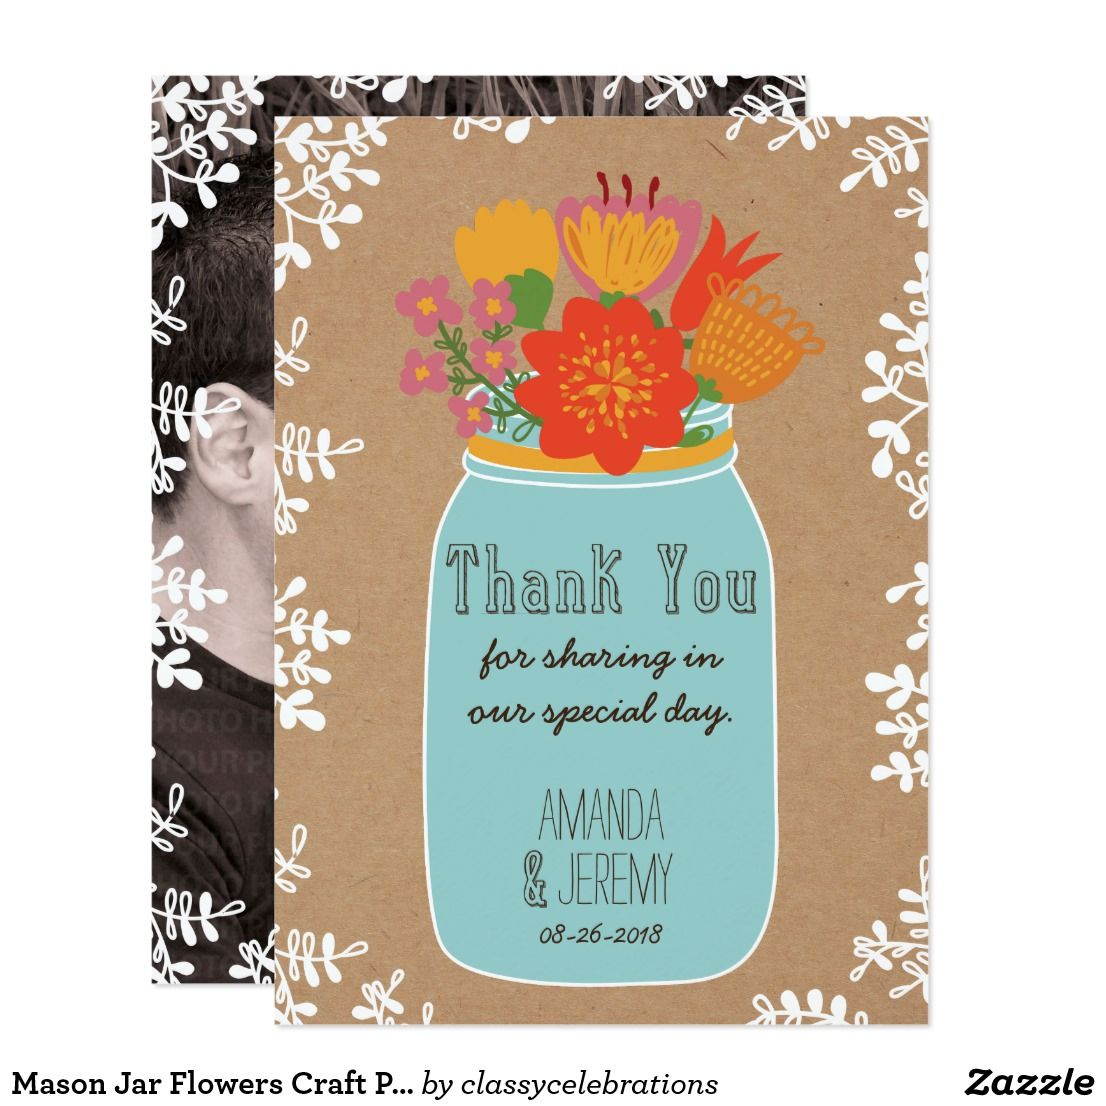 Mason jar flowers craft paper thank you photo